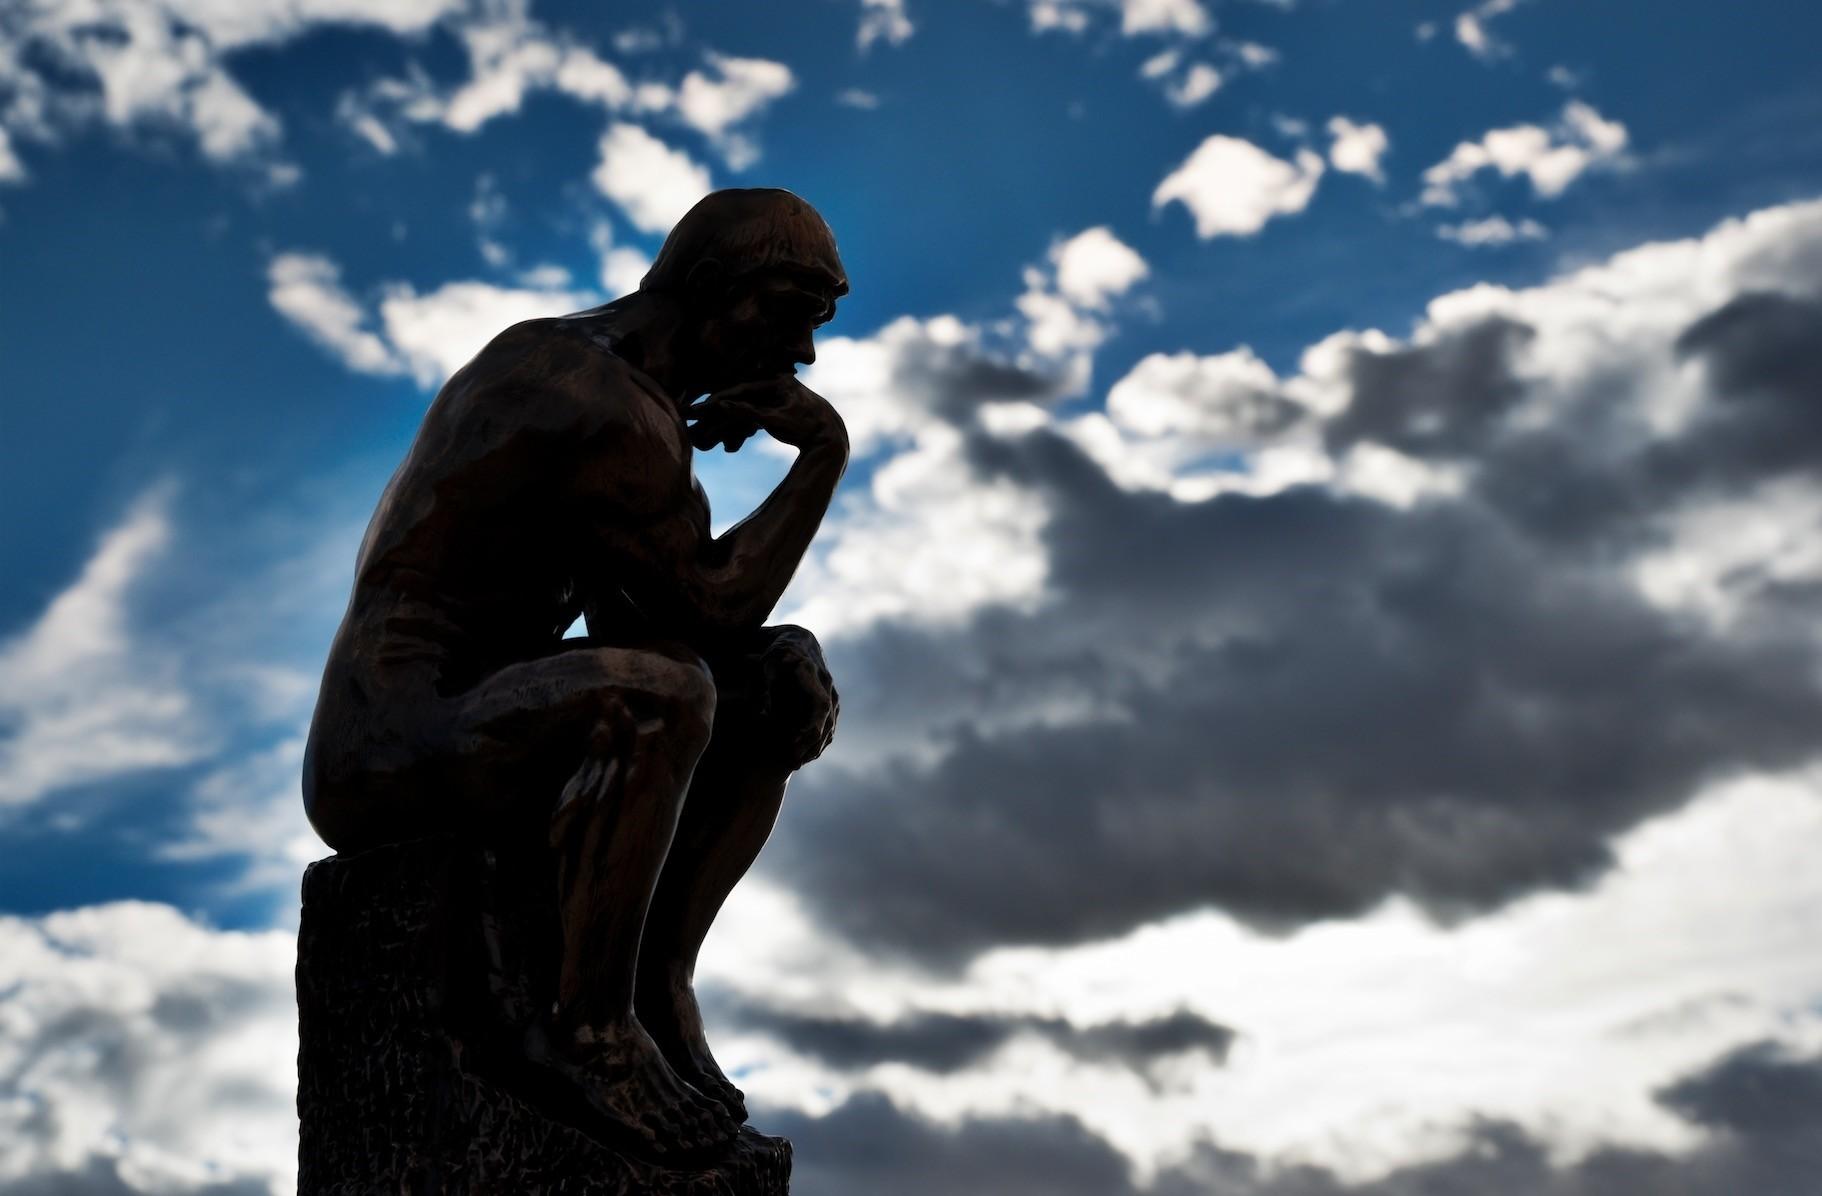 u201cThe Thinker,u201d a bronze sculpture by Auguste Rodin.